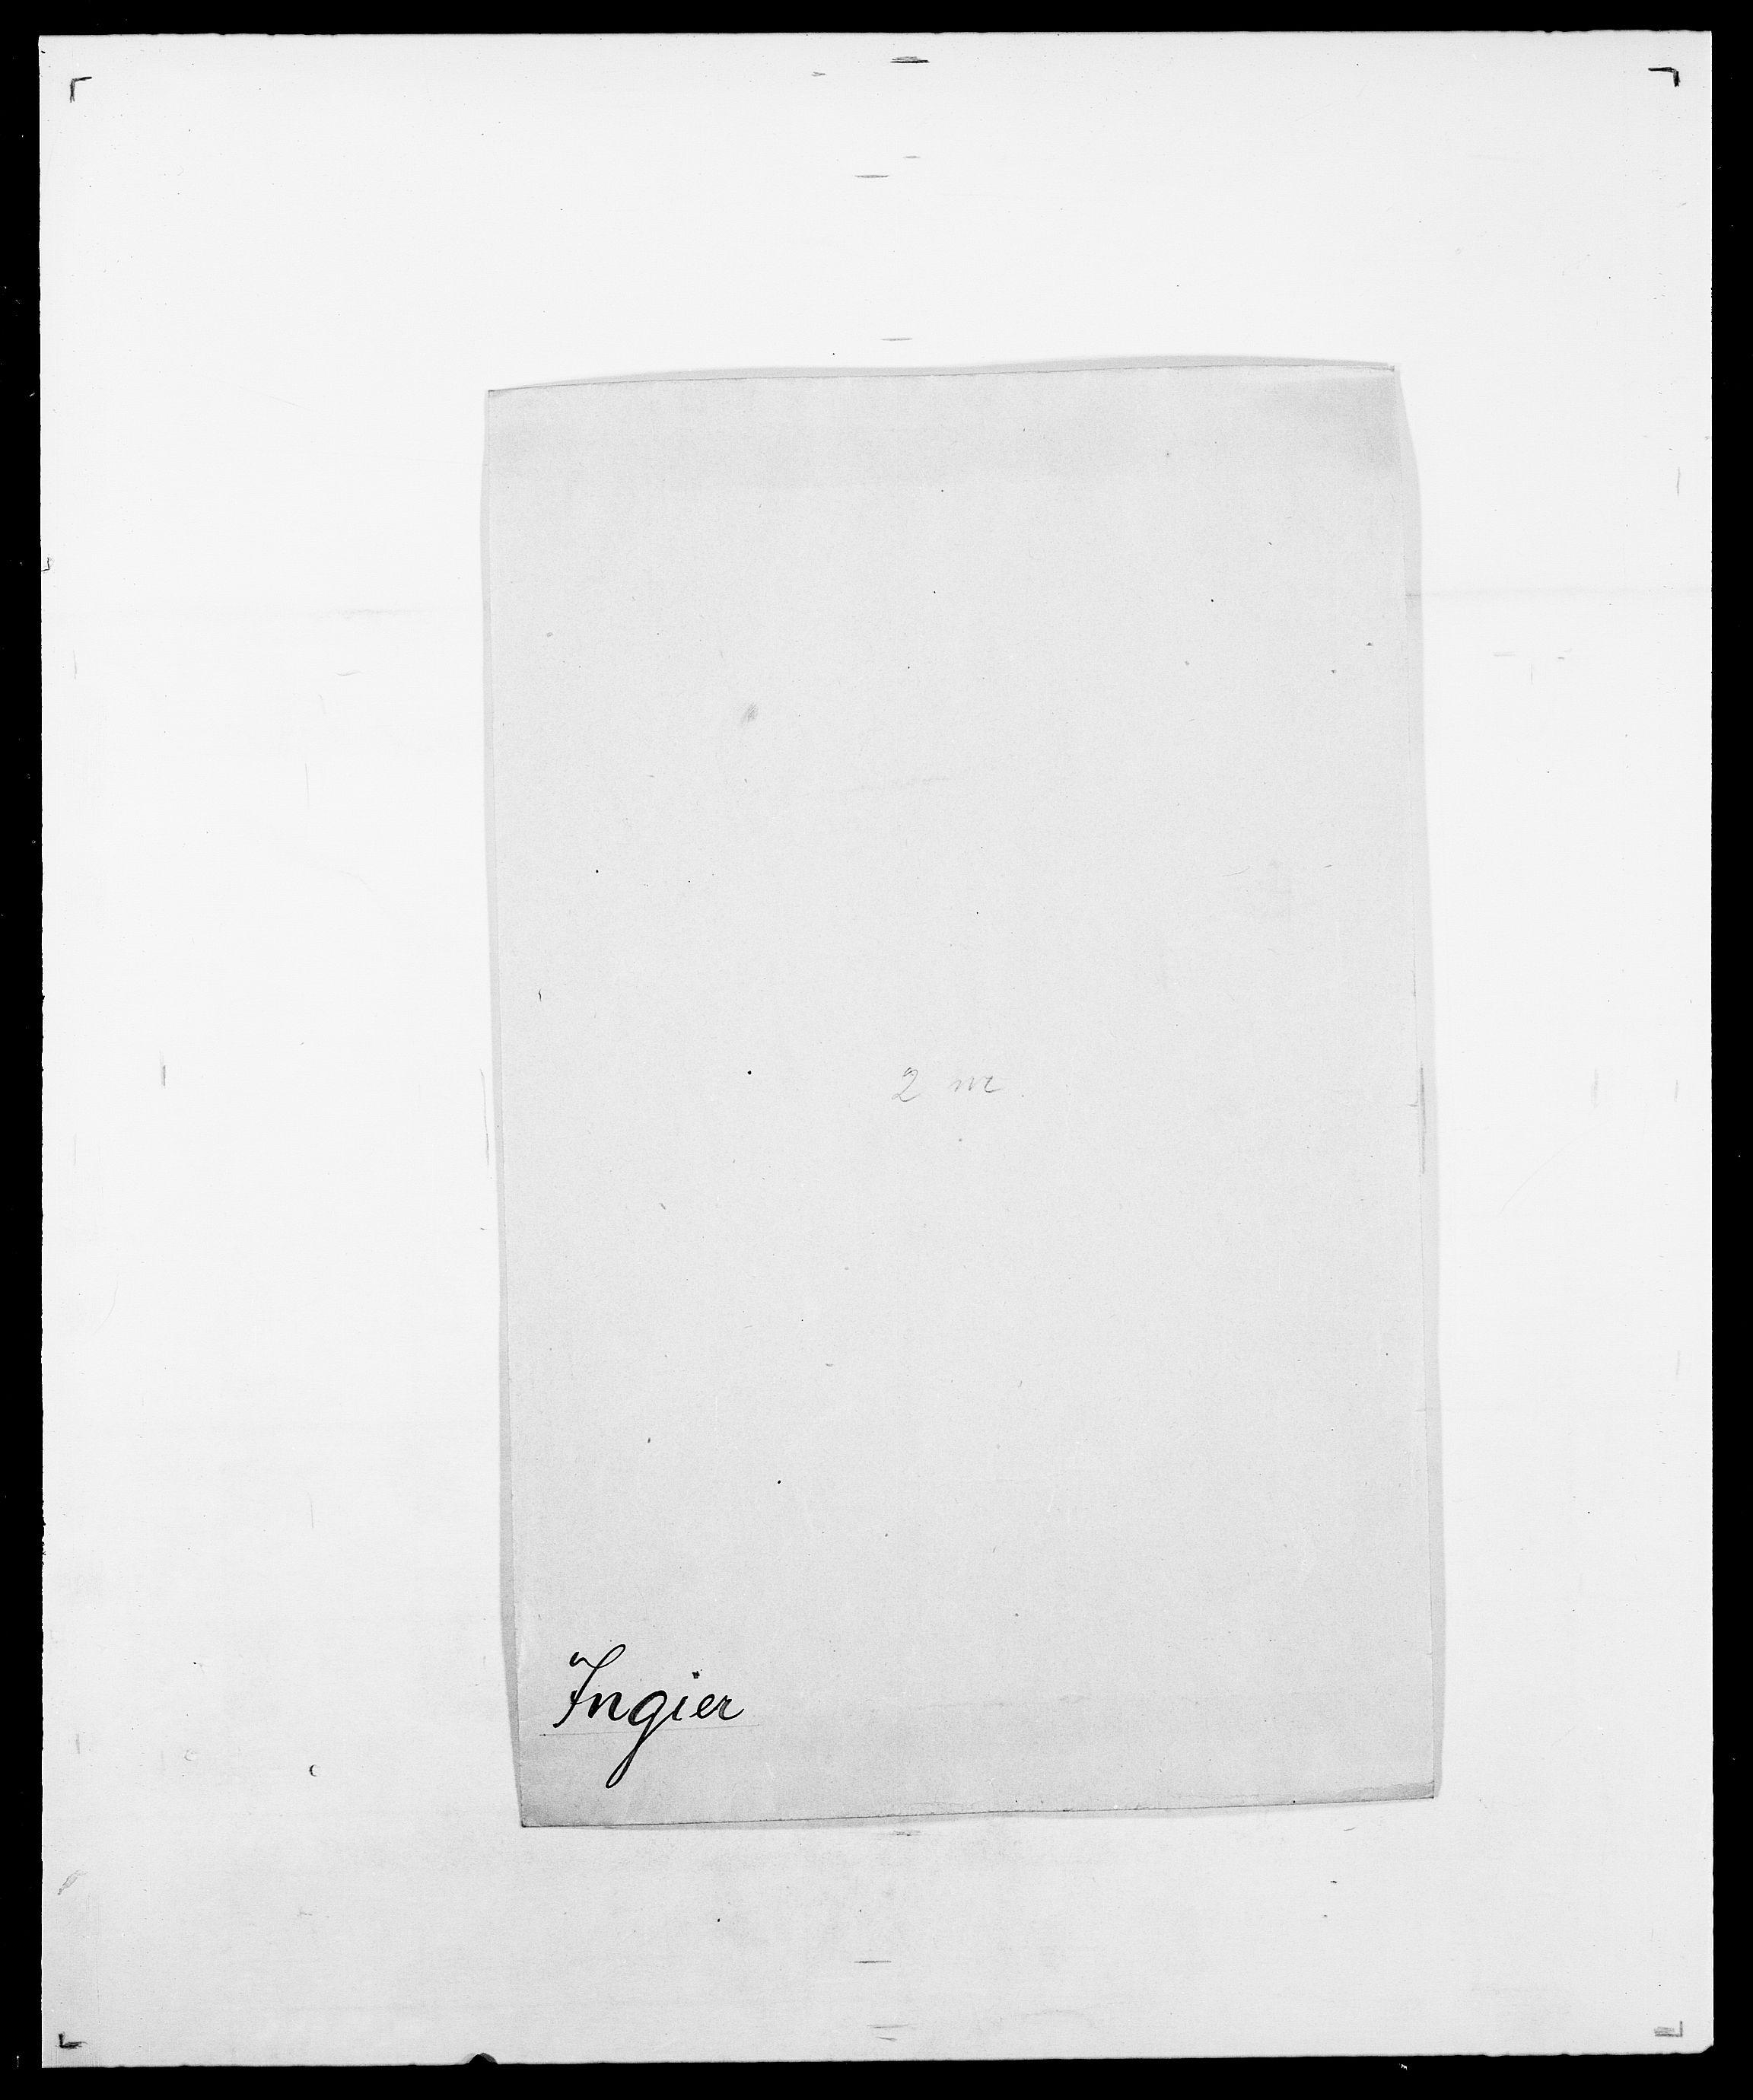 SAO, Delgobe, Charles Antoine - samling, D/Da/L0019: van der Hude - Joys, s. 791